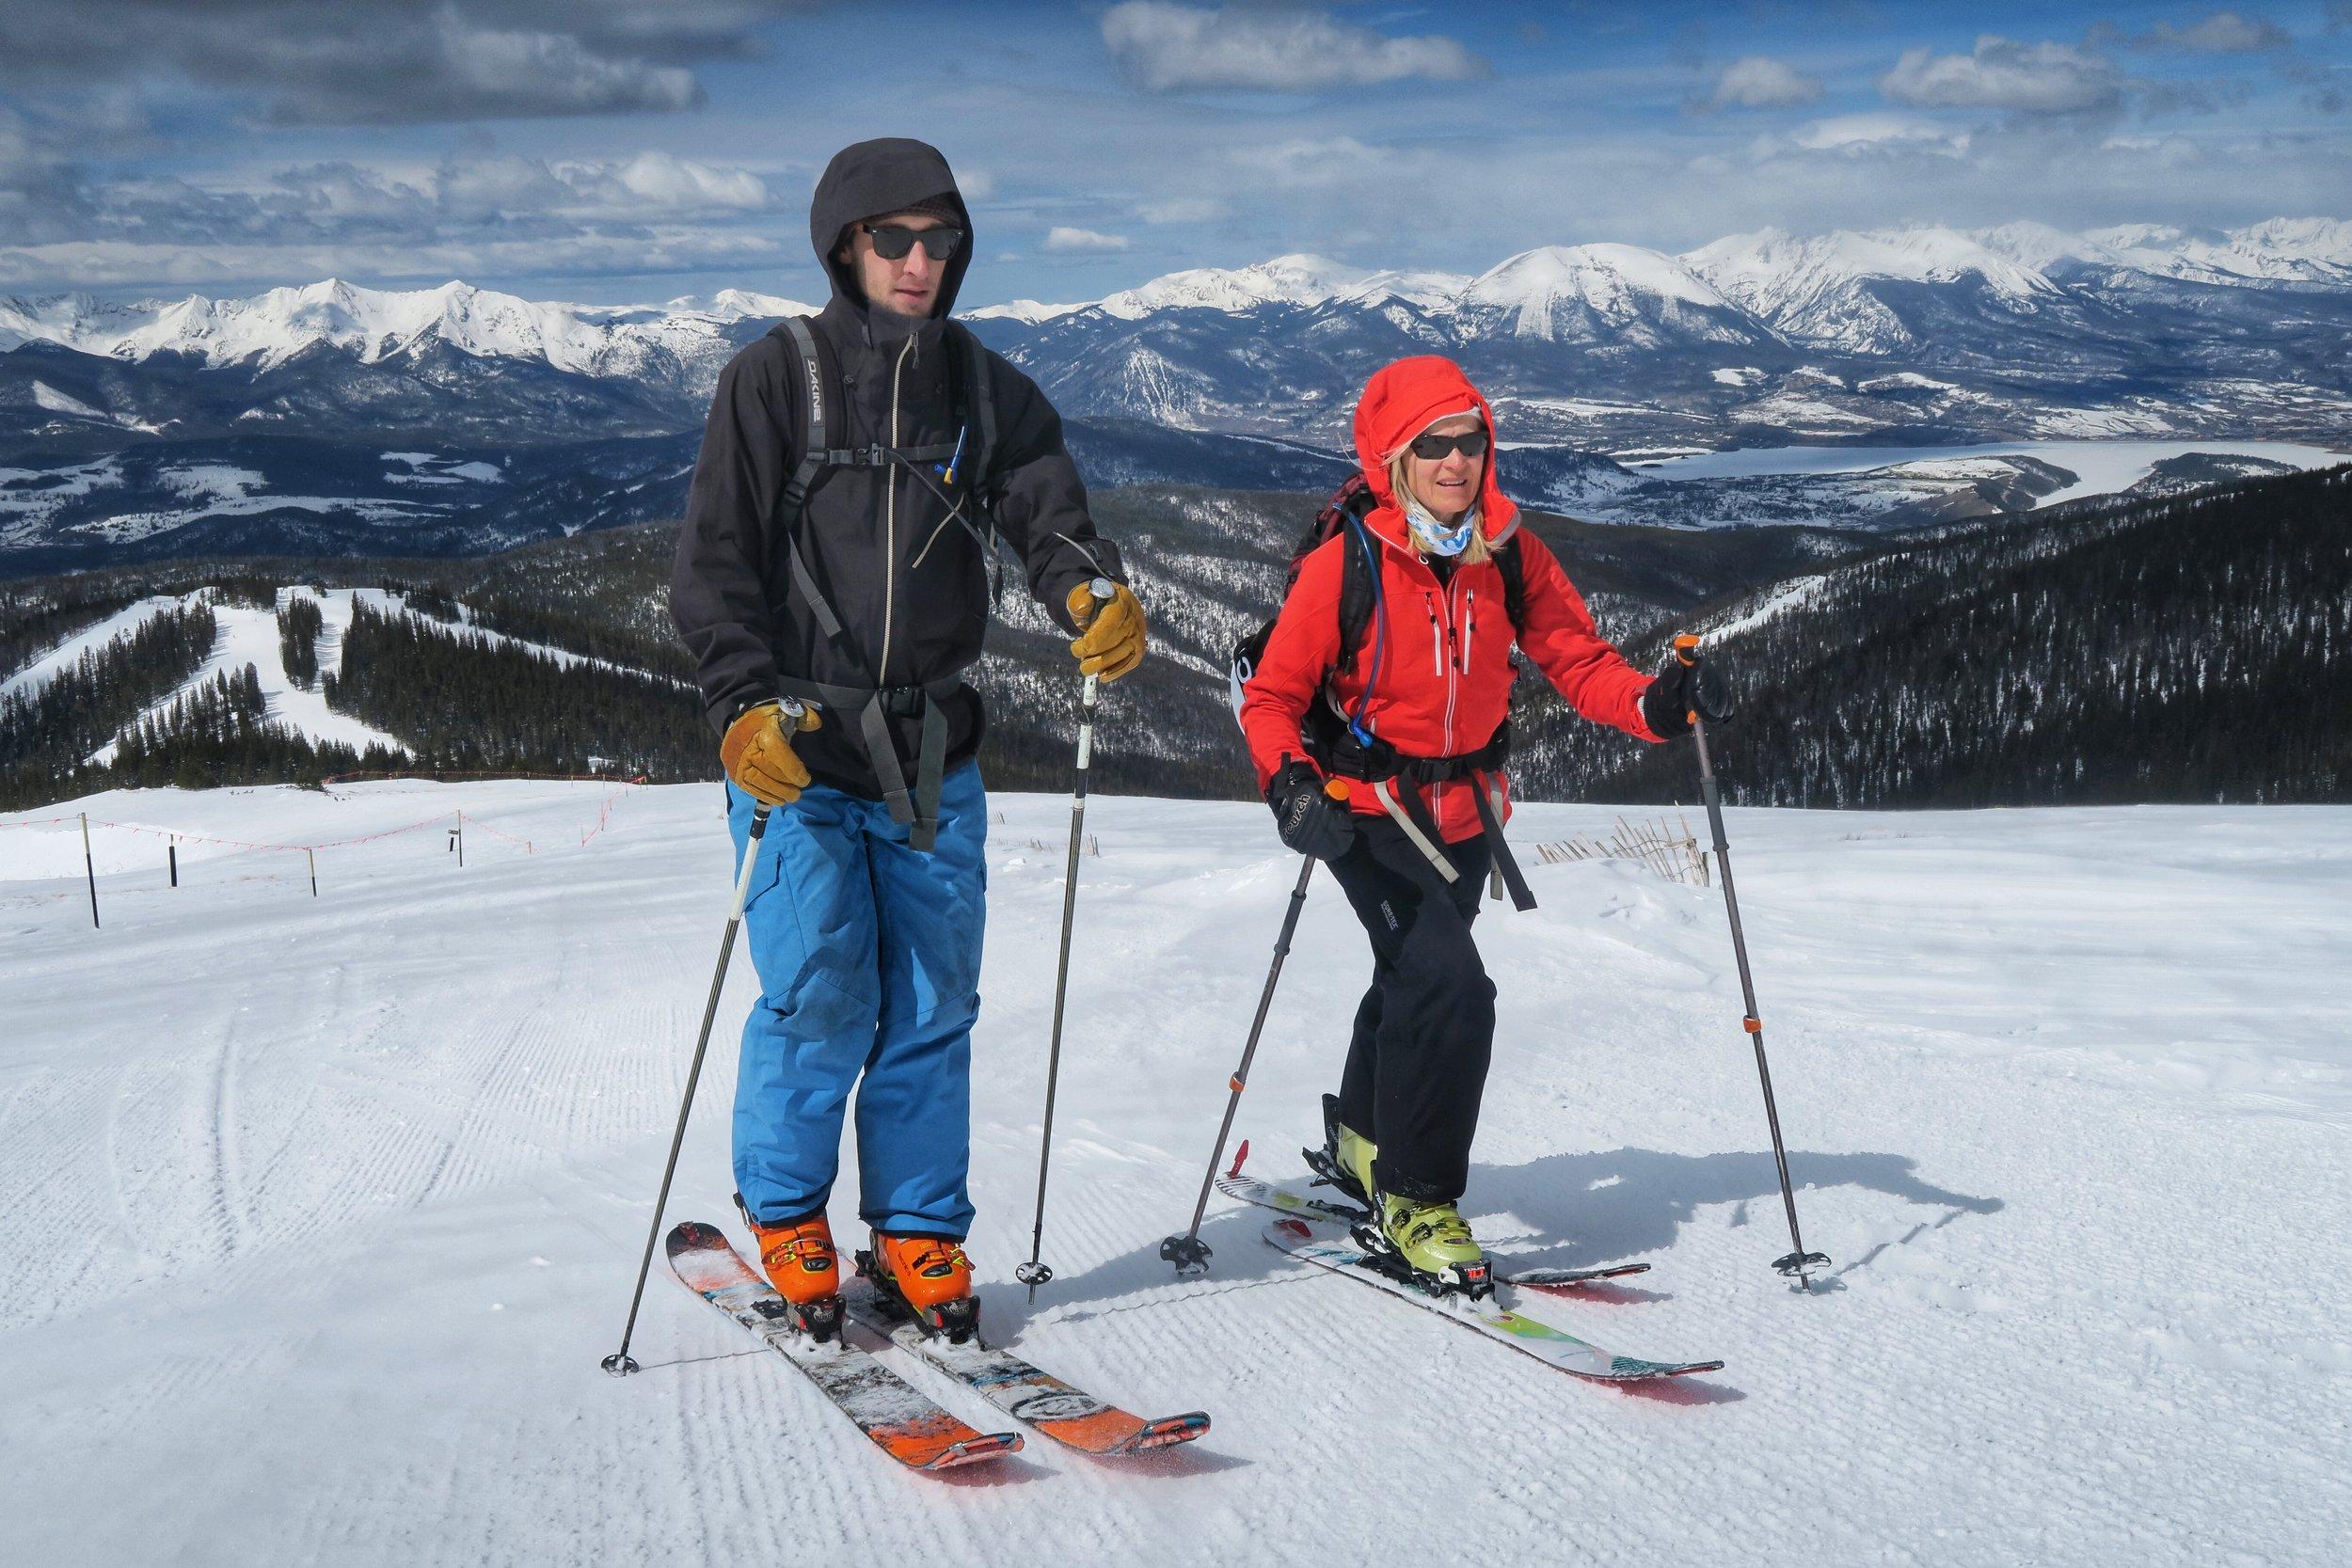 Shelee and son Matt b  ackcountry skiing in Colorado.